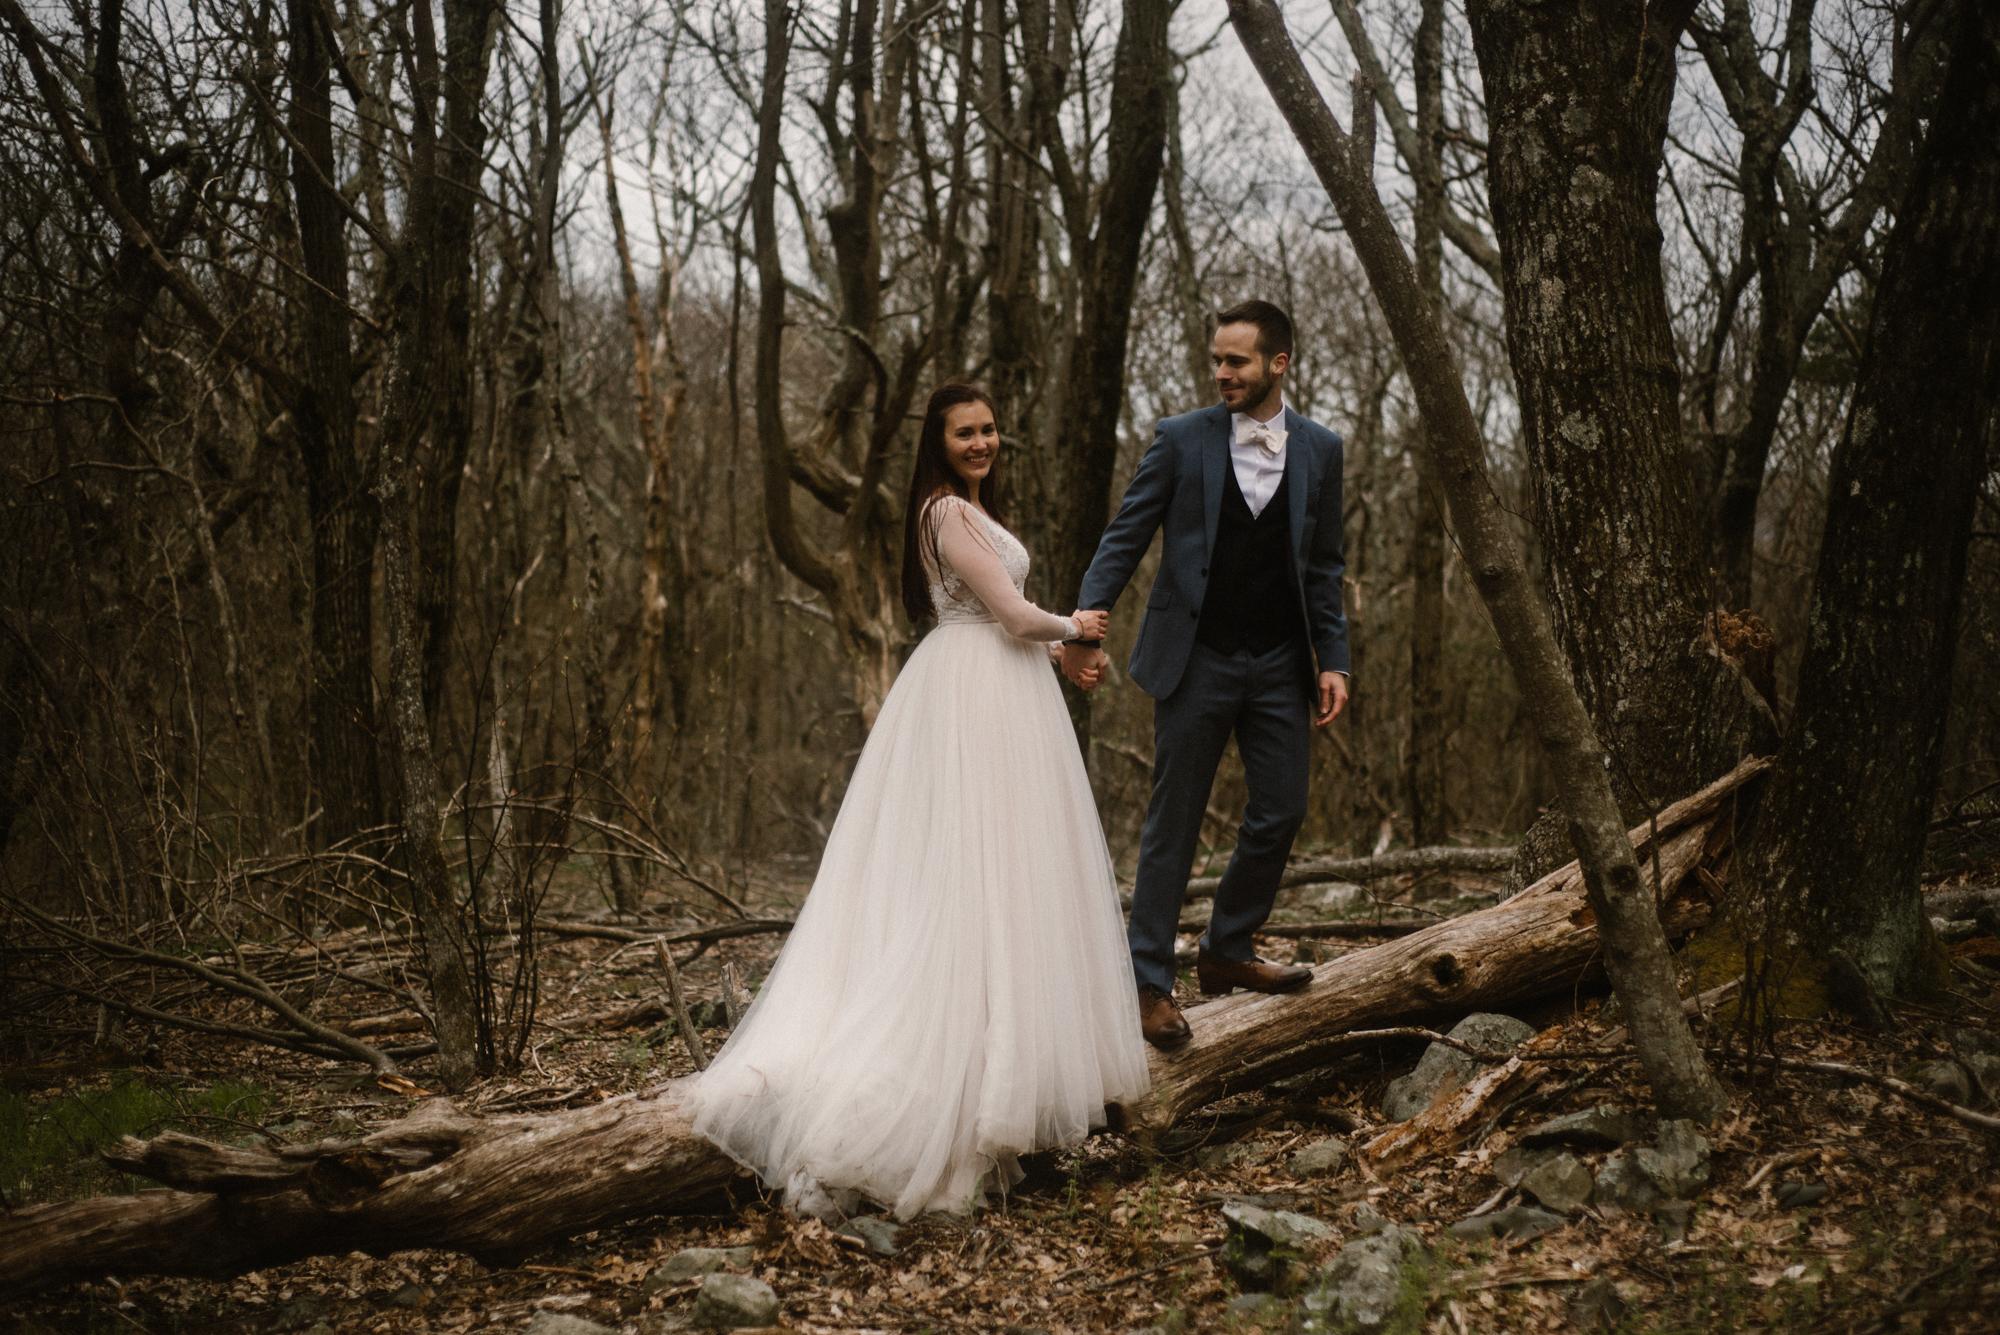 Paula and Andrew - Small Adventurous Wedding in Shenandoah National Park - Blue Ridge Mountain Wedding - White Sails Creative - Mountain Elopement_44.jpg